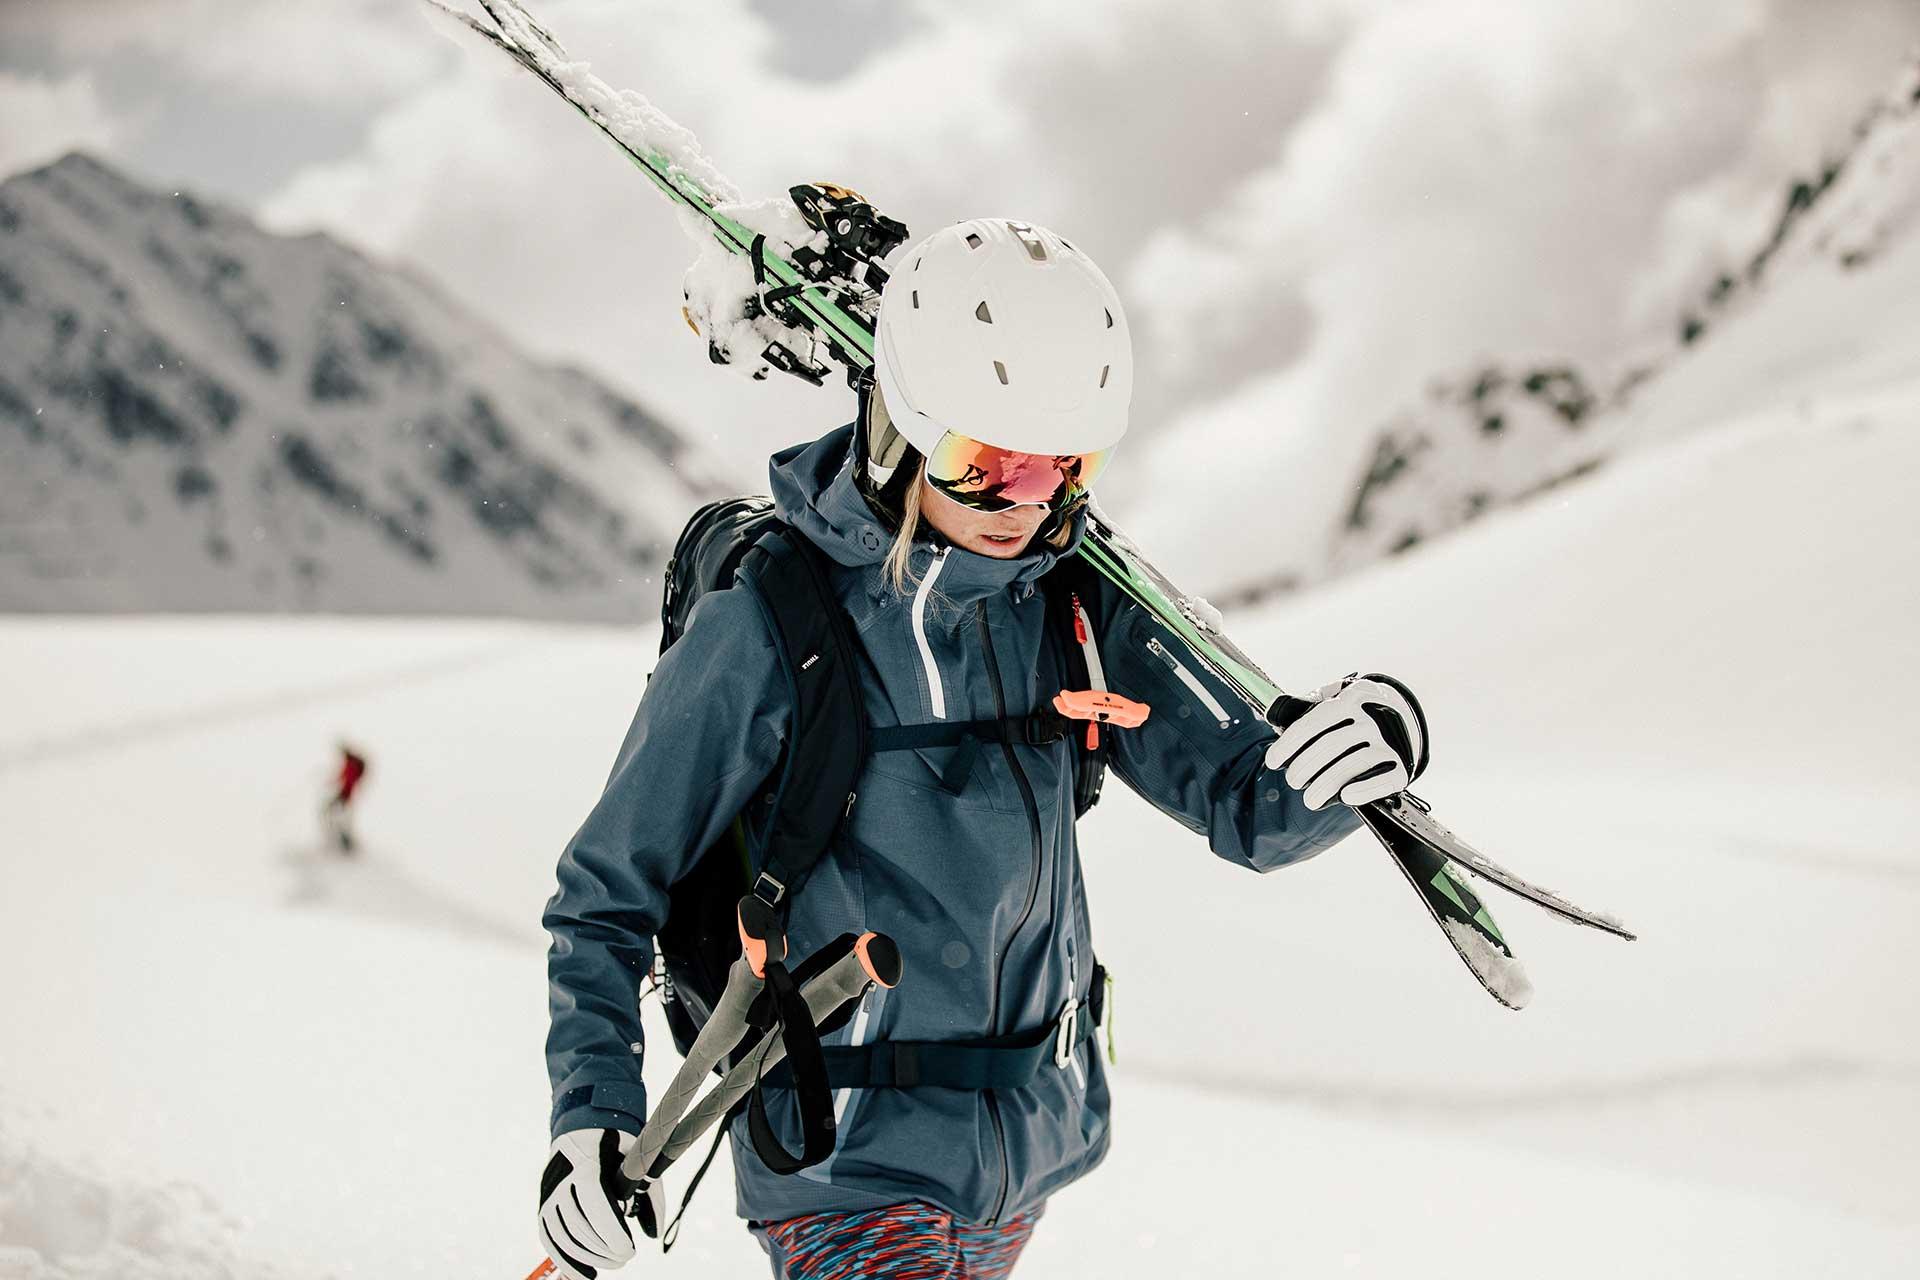 Pulverschnee Skisport Fotoproduktion Model Fotograf Michael Müller Berlin